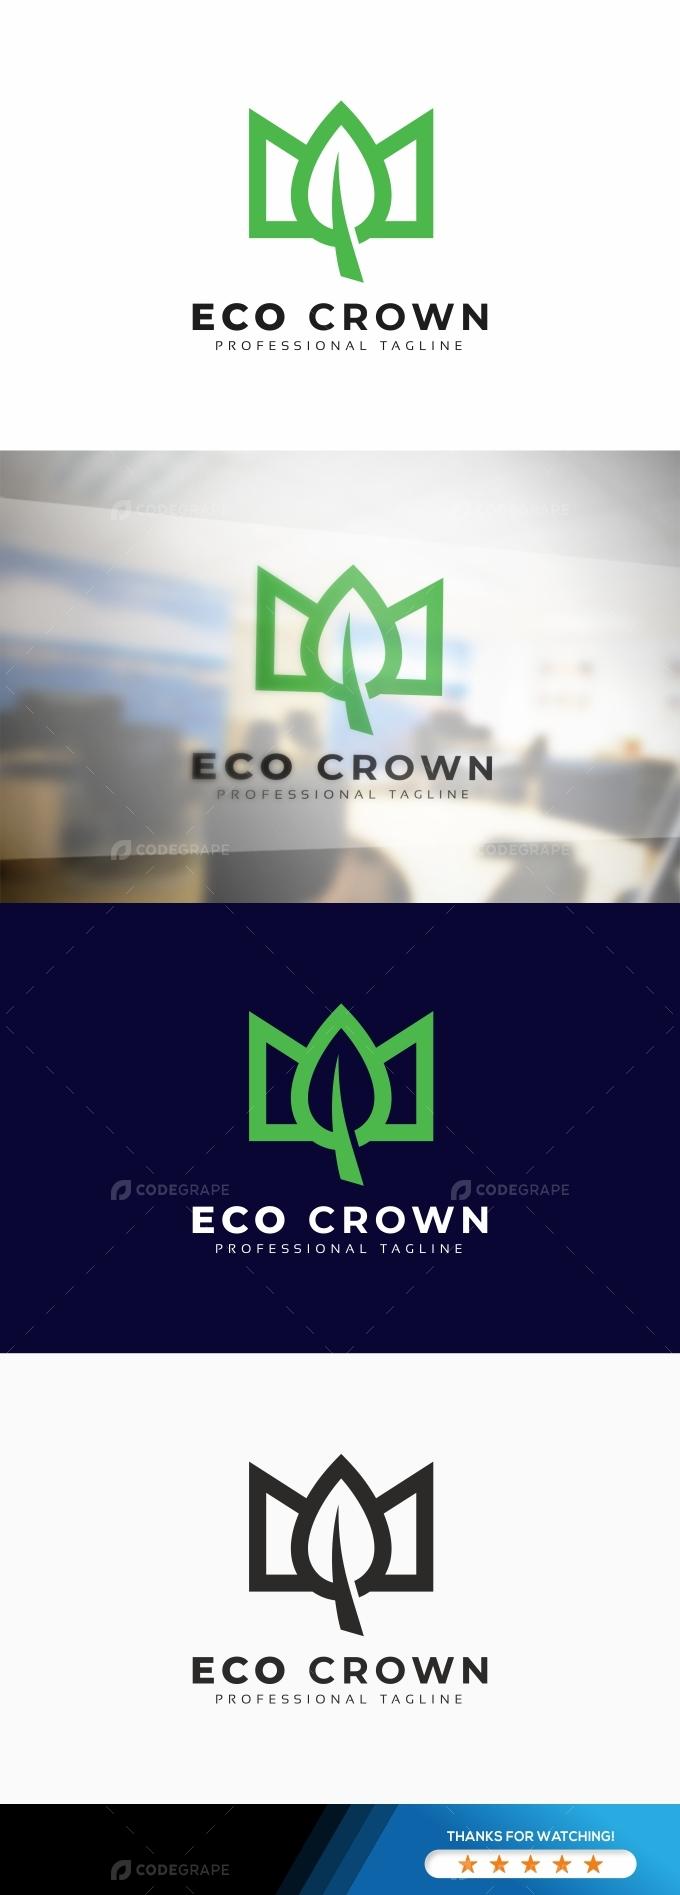 Eco Crown Logo